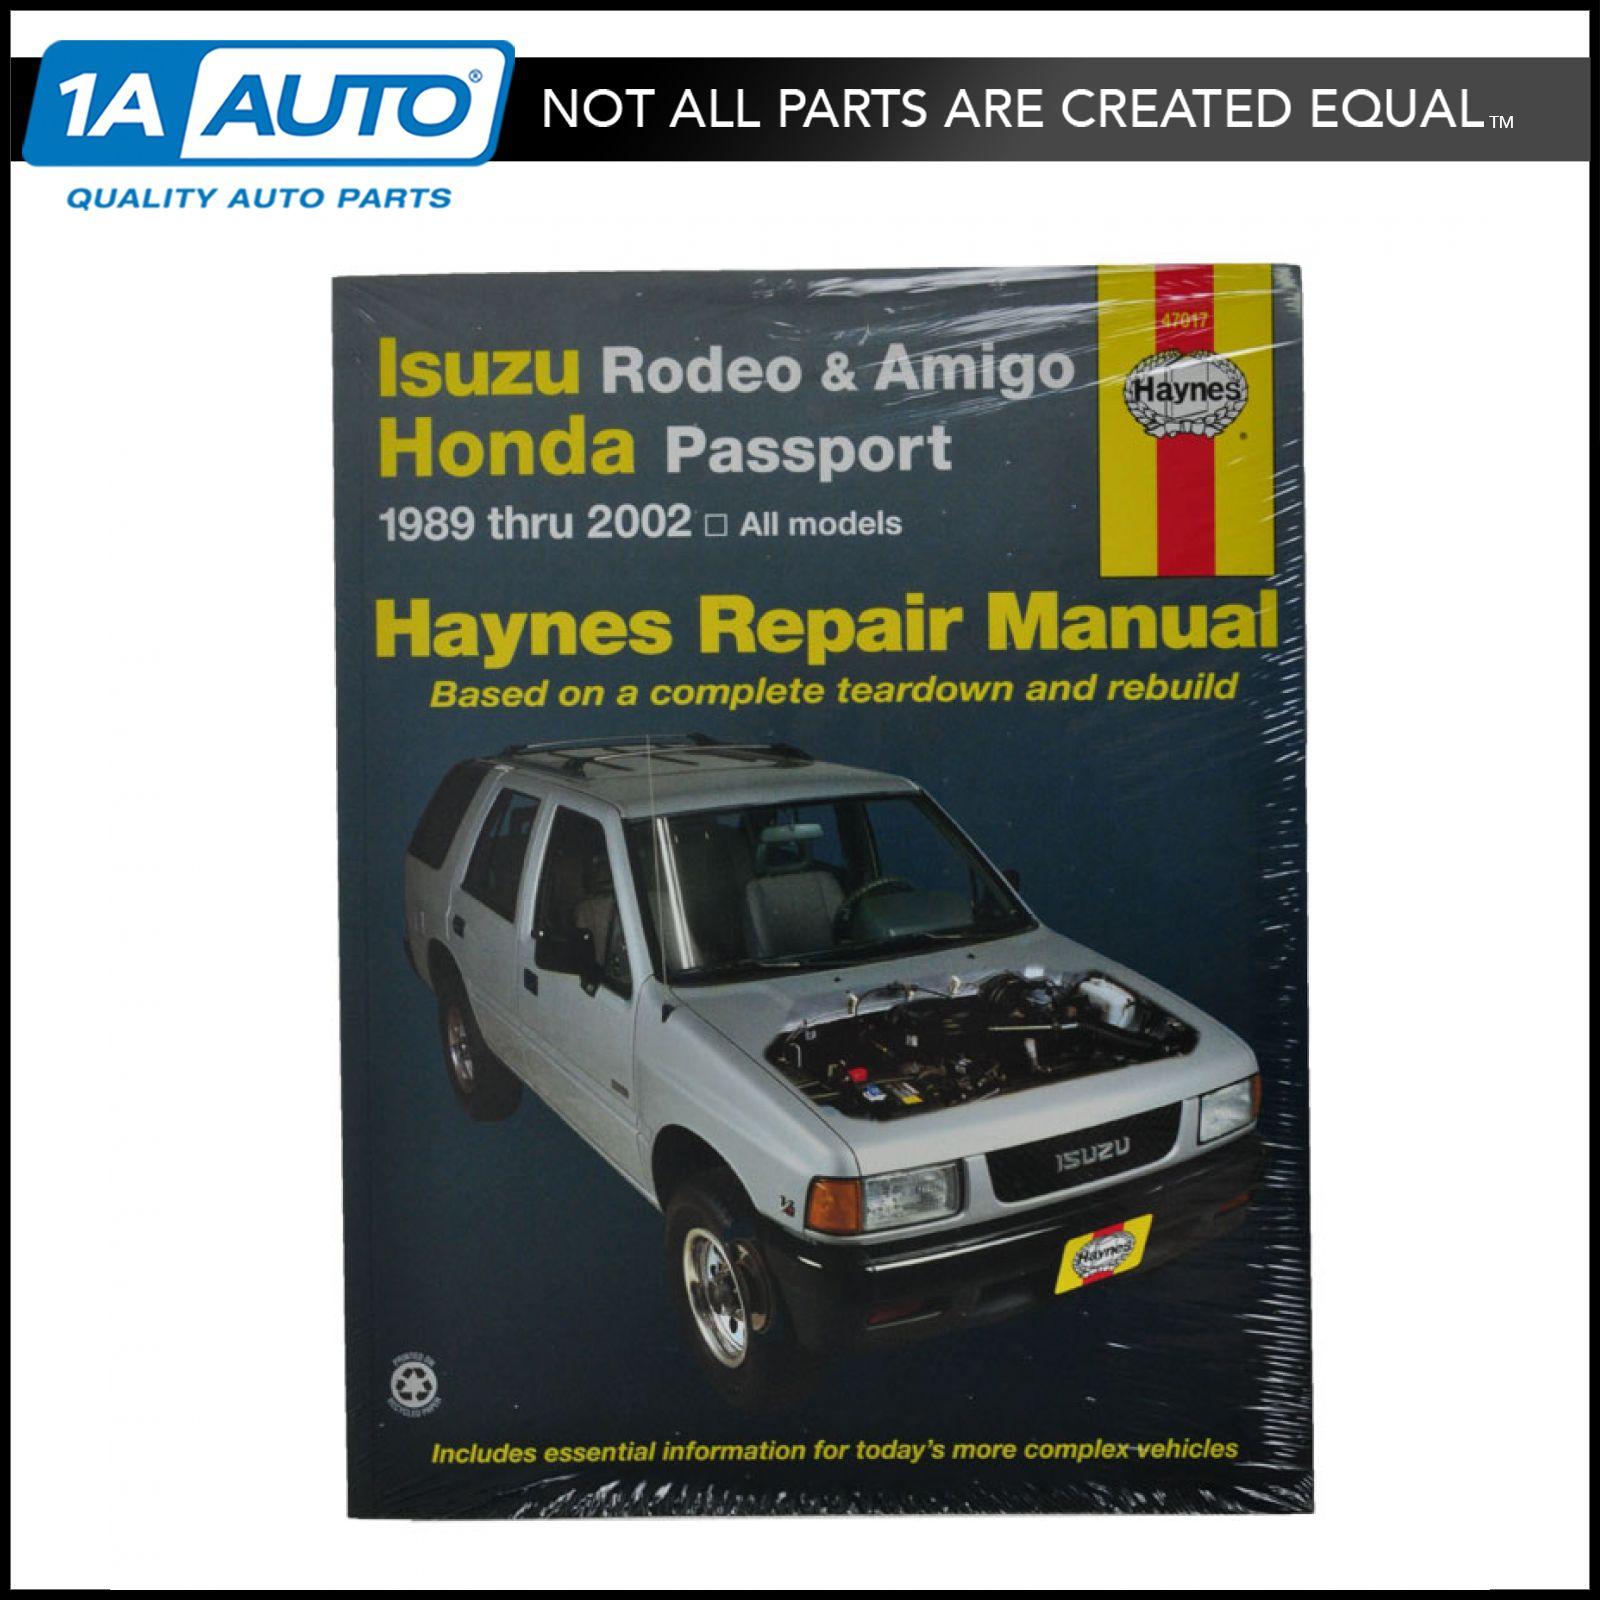 haynes repair manual for amigo passport rodeo 89 90 91 02 ebay rh ebay com Isuzu  Trooper Engine Diagram 1995 Isuzu Pickup Parts